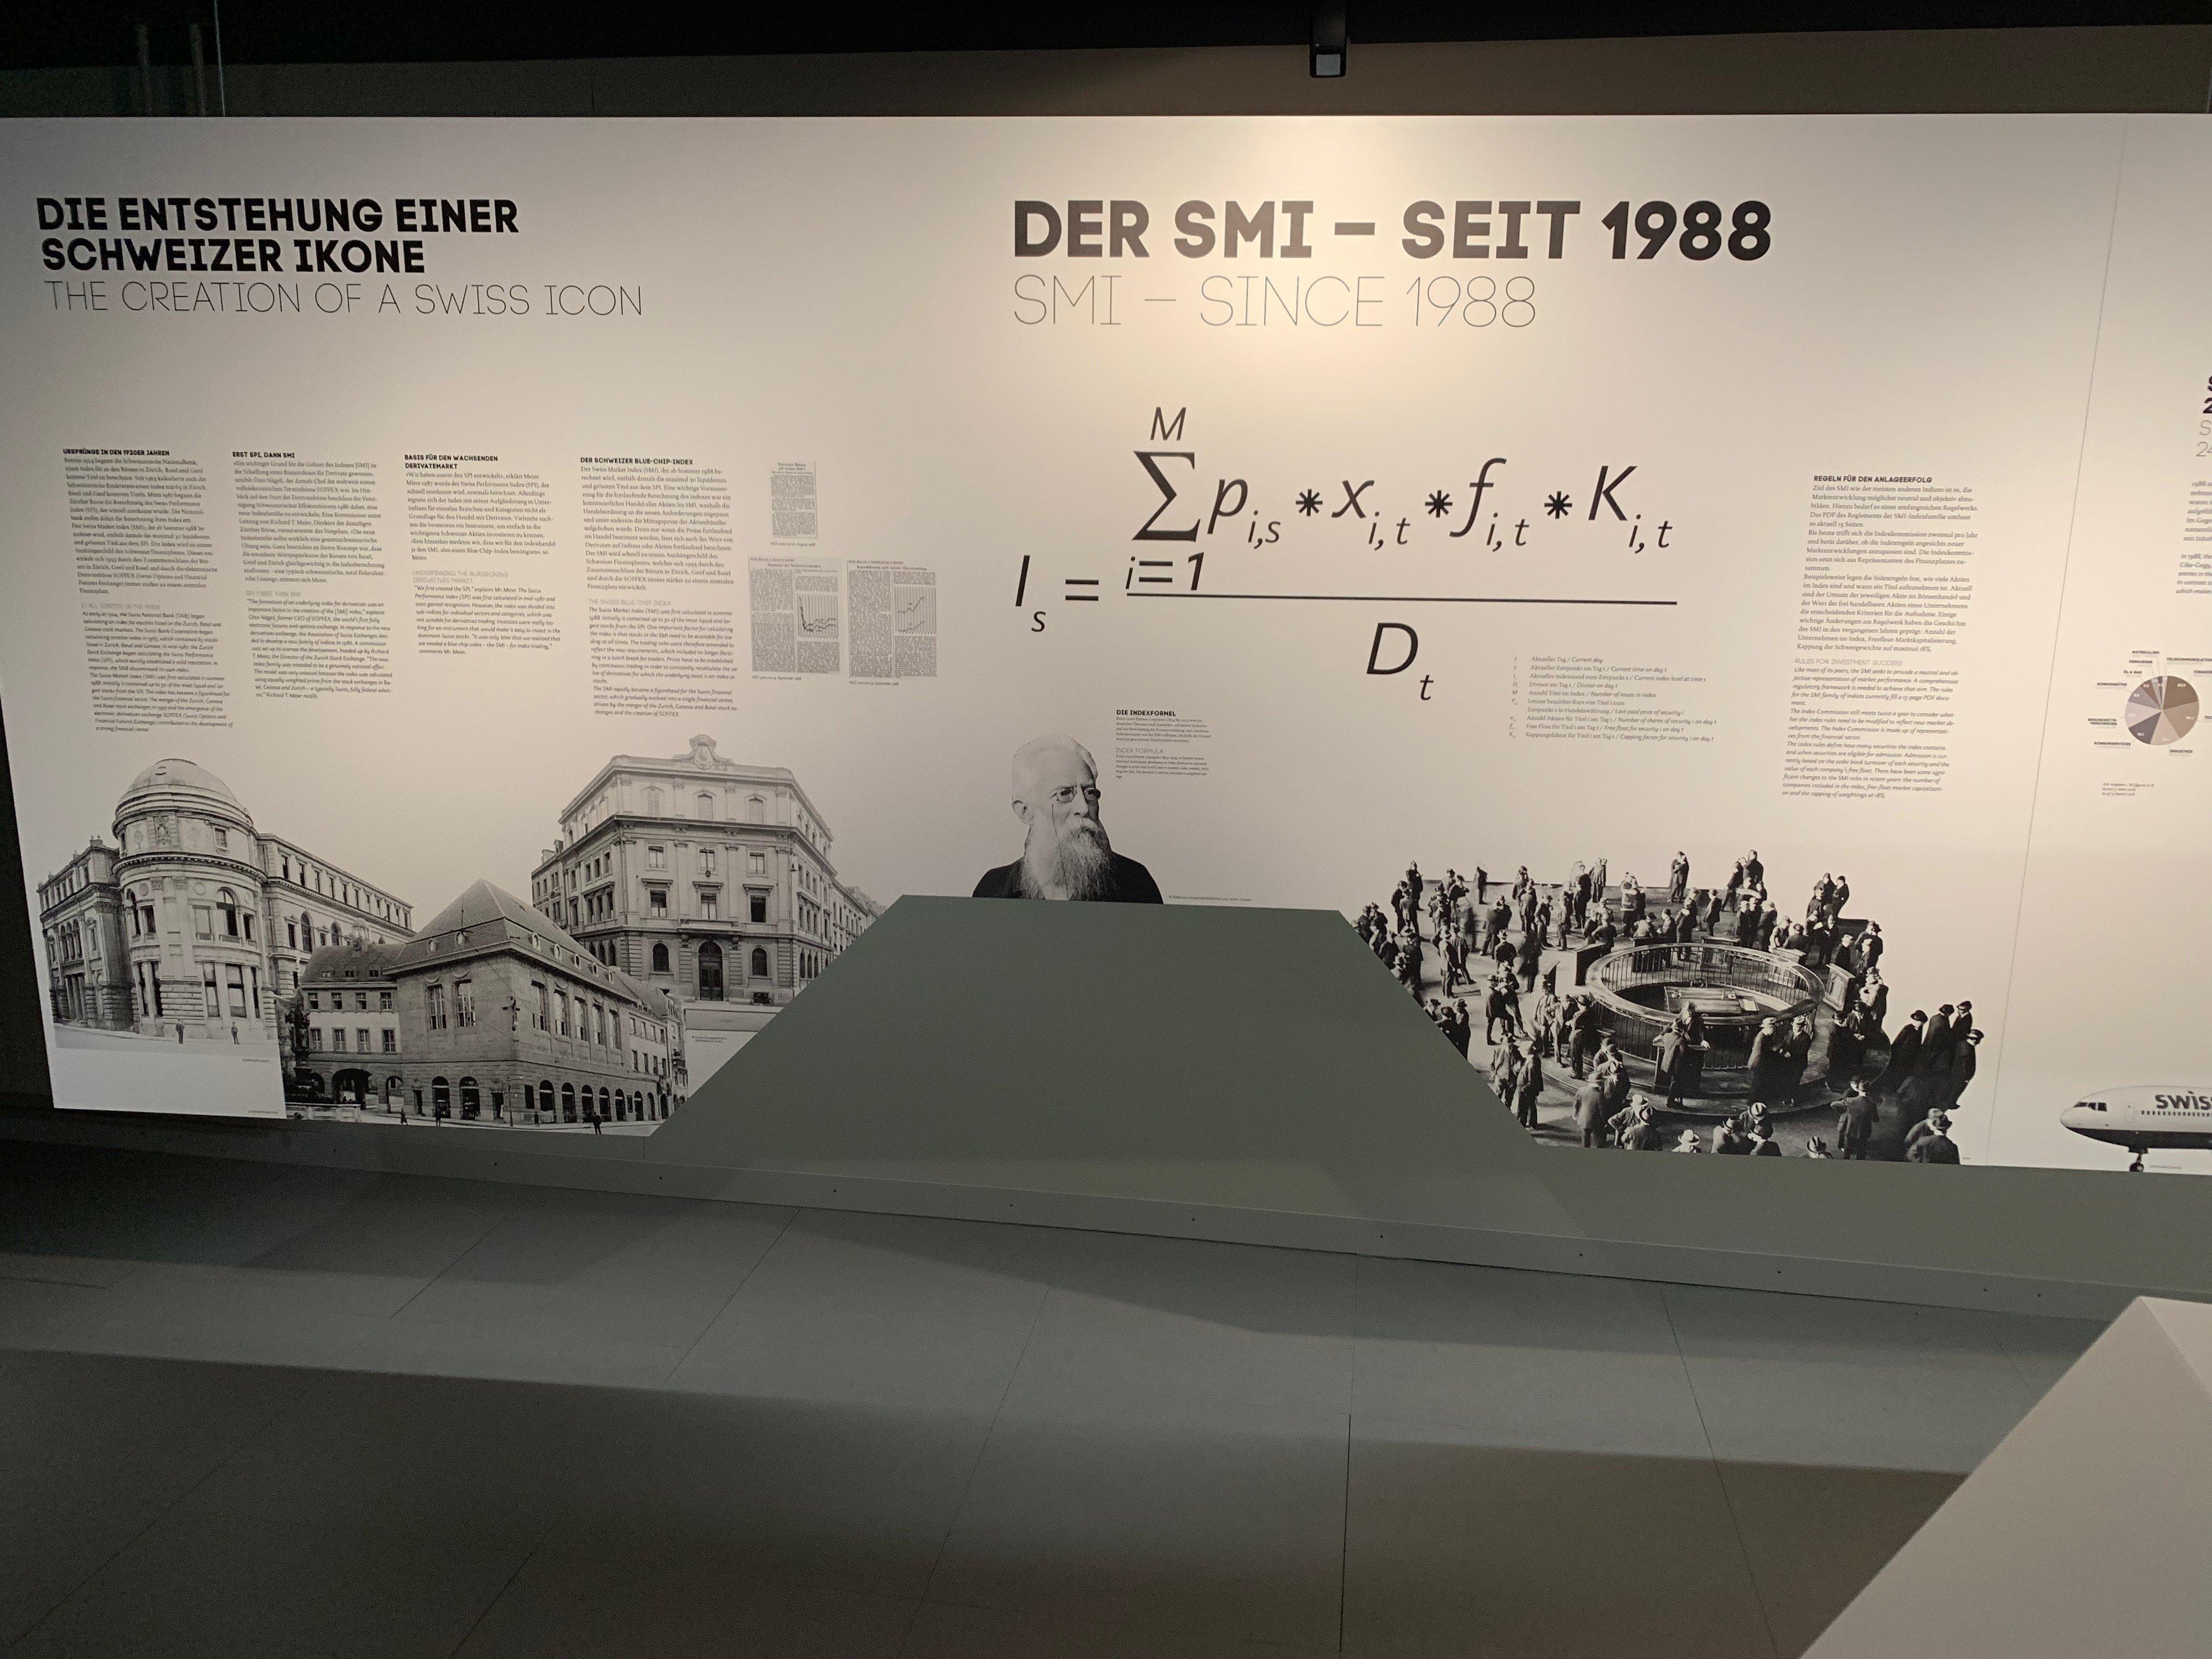 CUsersLCDesktopBLOG-picturesZurich_museum3